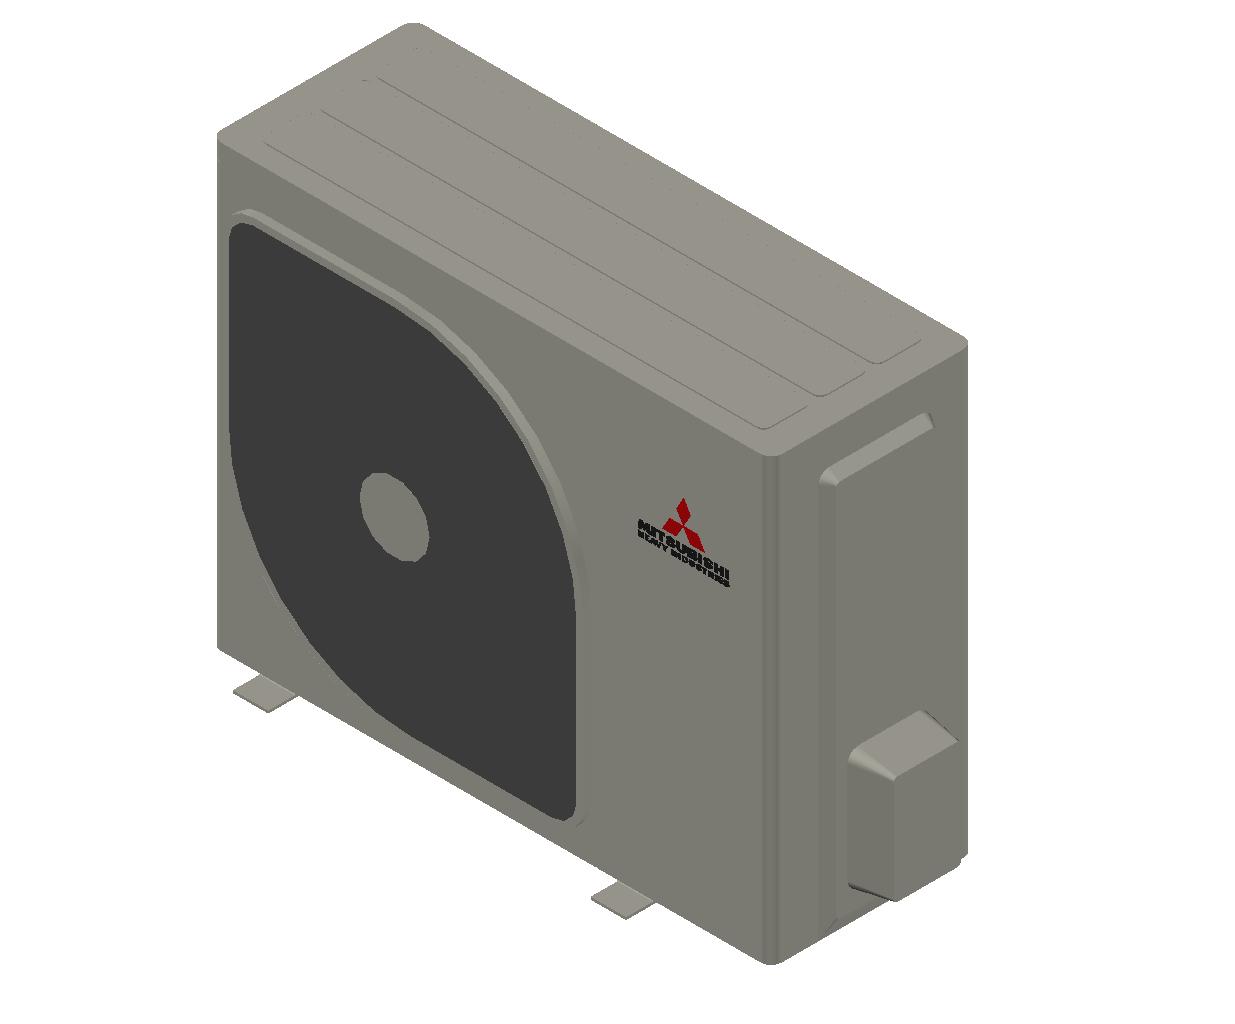 HC_Heat Pump_MEPcontent_Mitsubishi Heavy Industries_PAC-RAC_SRC60ZSX-S_INT-EN.dwg